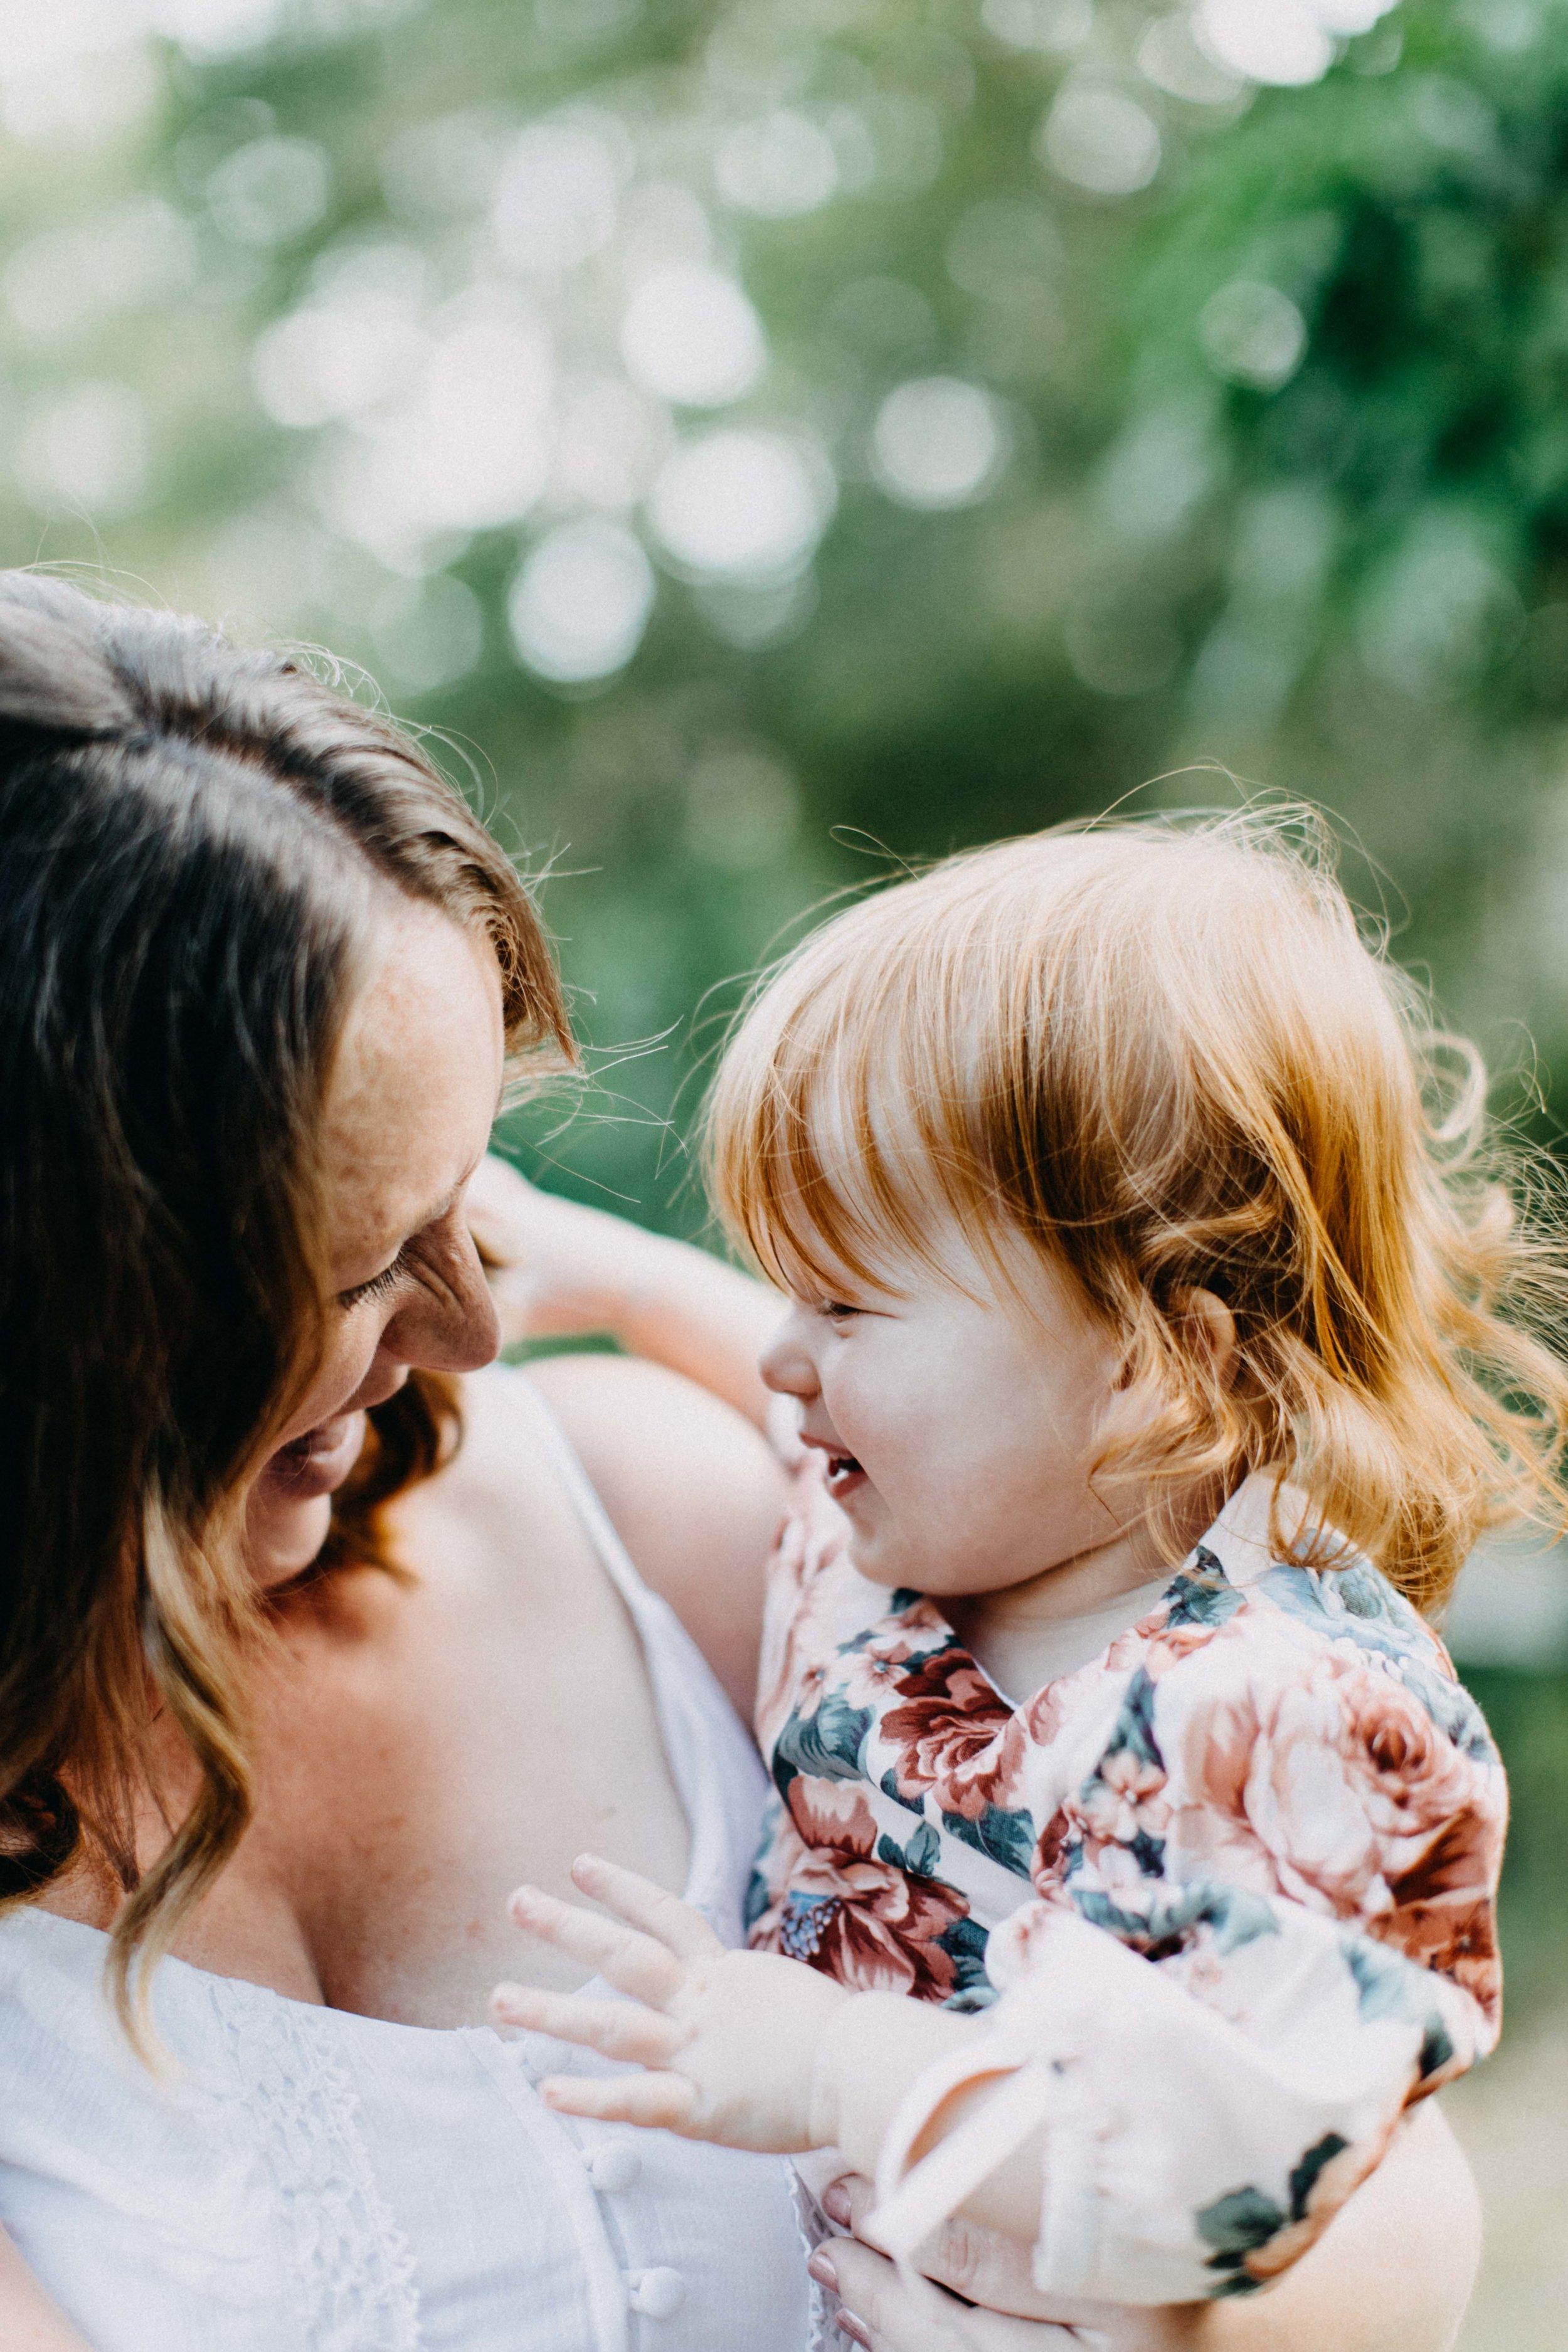 southern-highlands-maternity-photography-macarthur-ruth-www.emilyobrienphotography.net-34.jpg